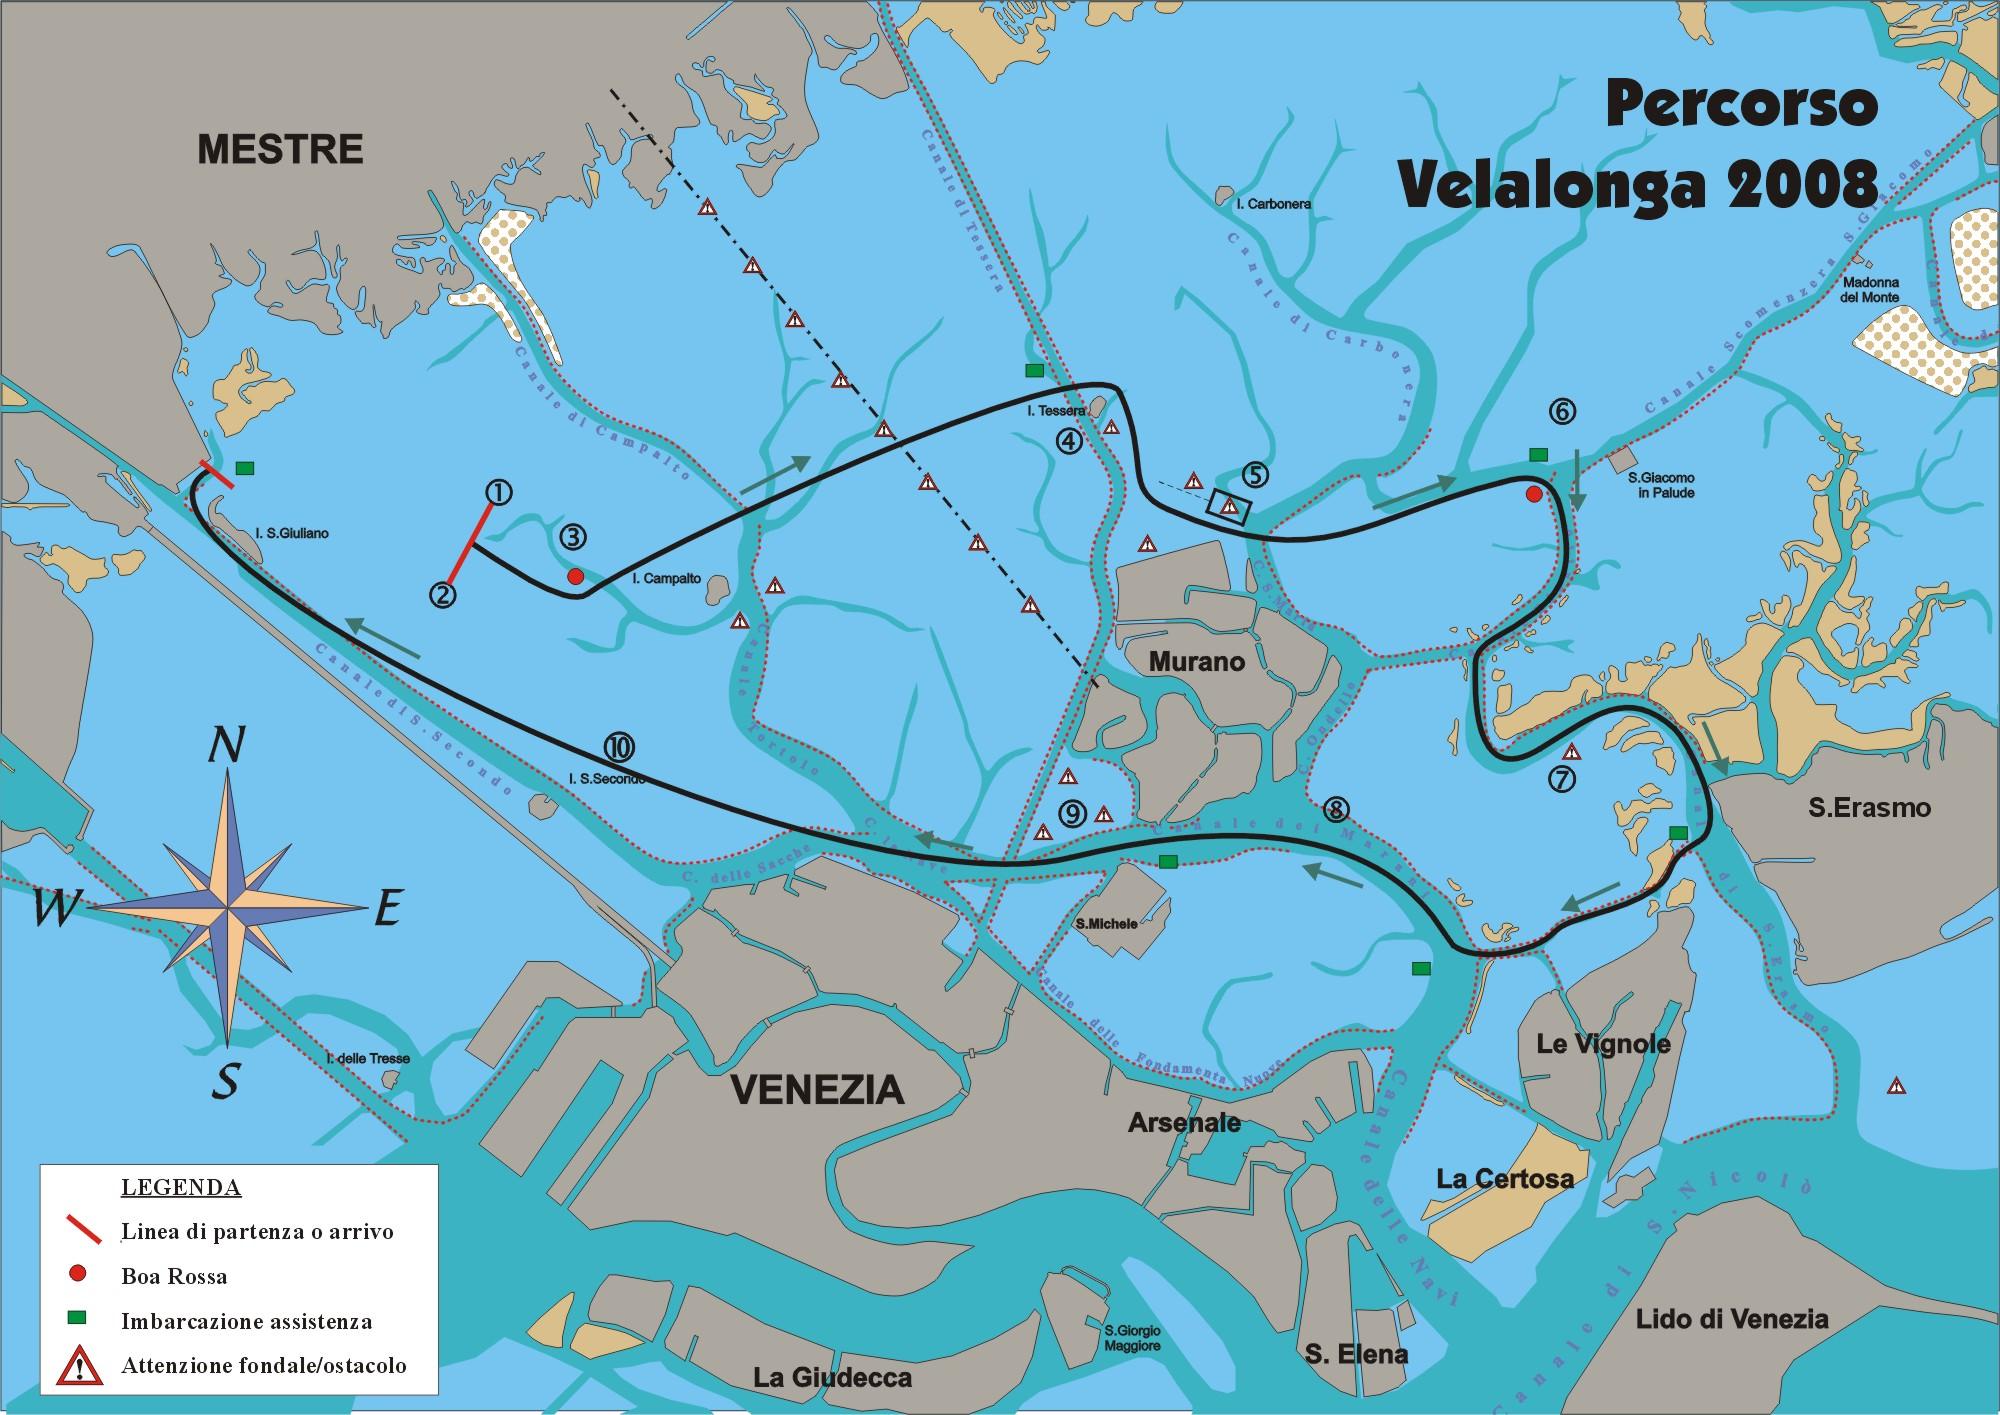 Cartina Laguna Di Venezia.Carta Nautica Della Laguna Di Venezia Velablog Mistro